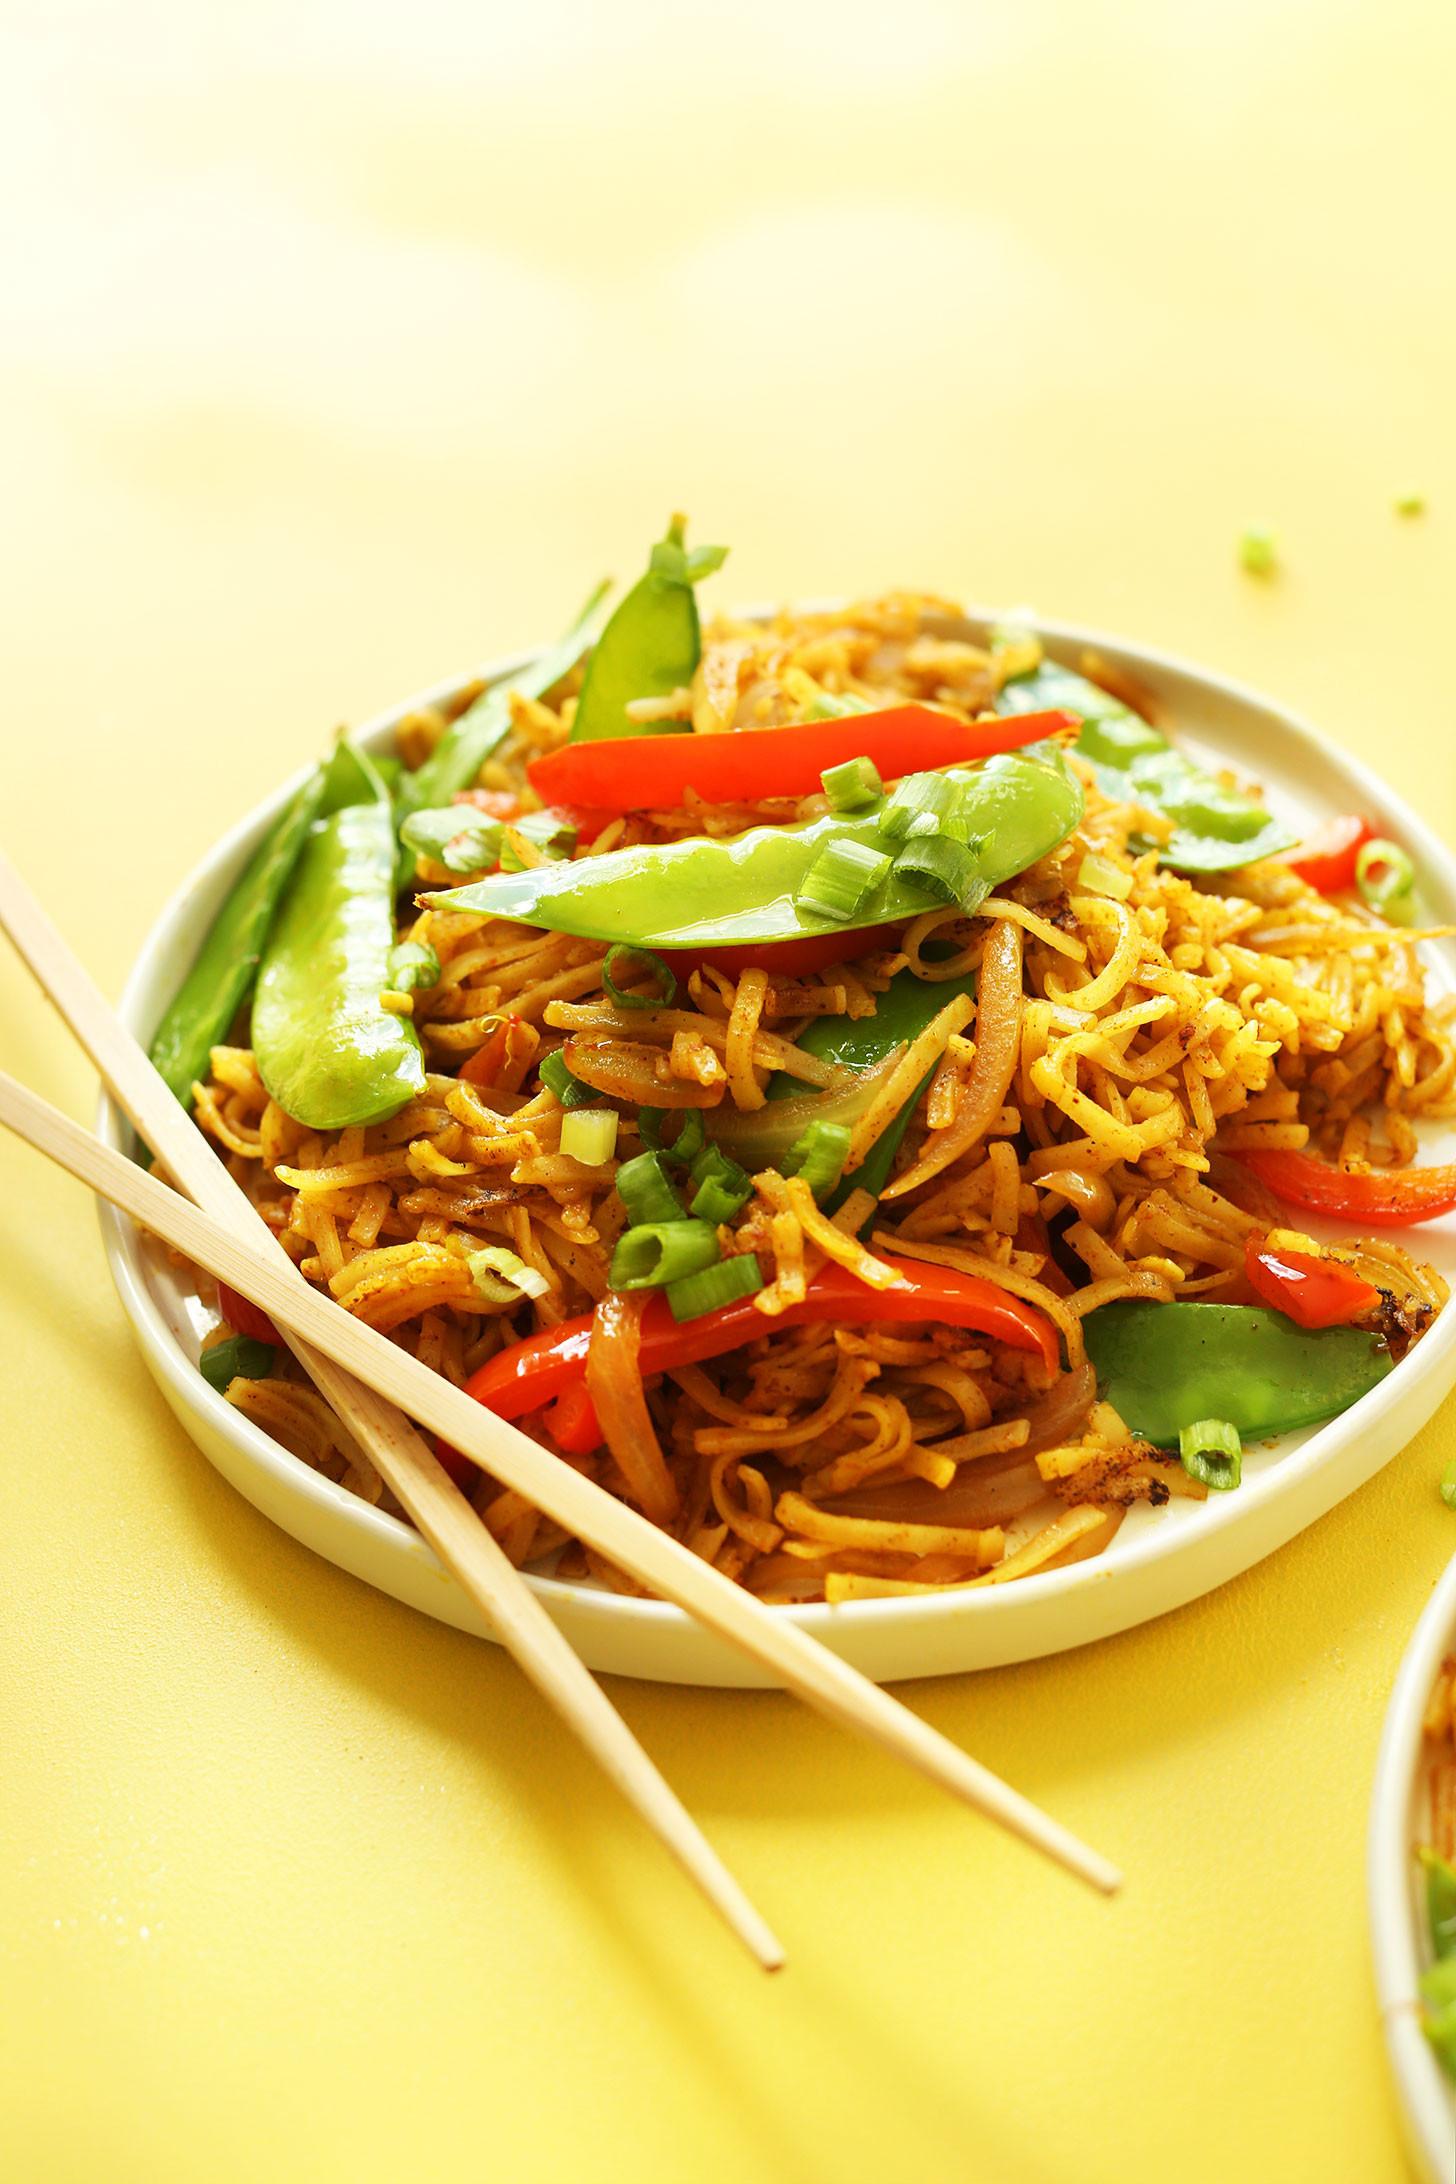 Vegan Rice Noodle Recipes  EASY Vegan Singapore Noodles 10 ingre nts simple